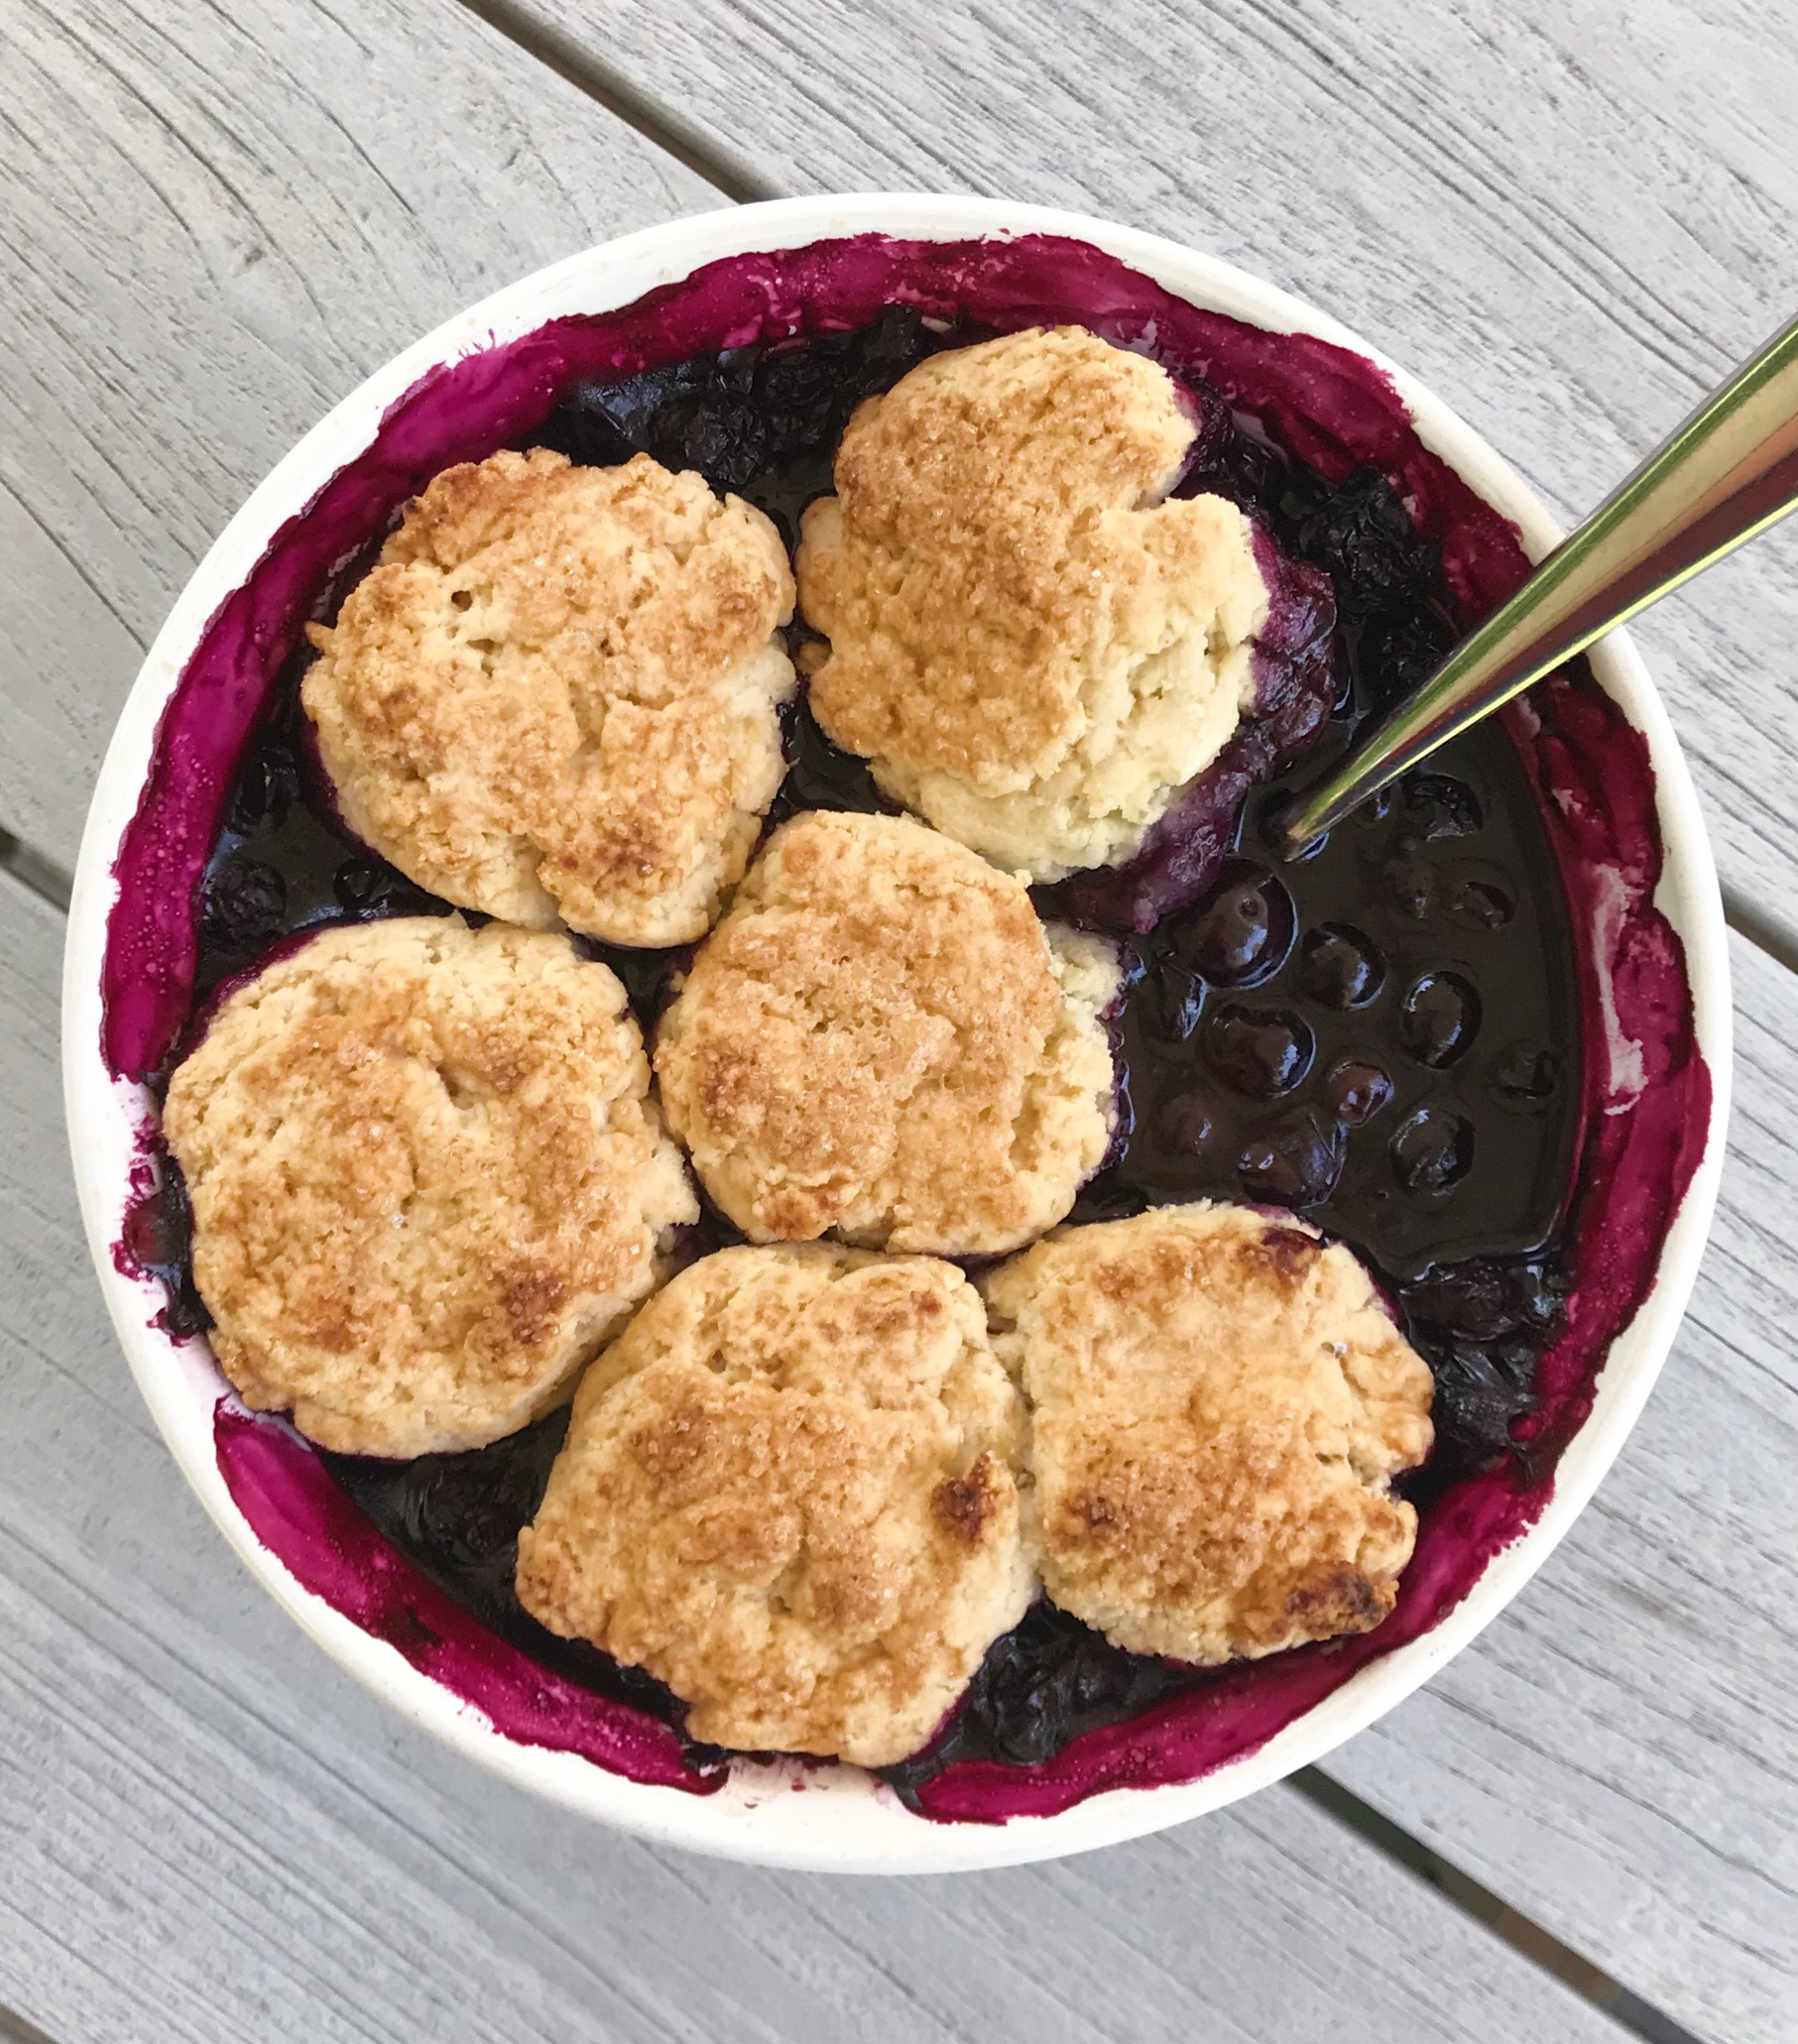 gluten free vegan blueberry cobbler #glutenfreerecipes www.healthygffamily.com